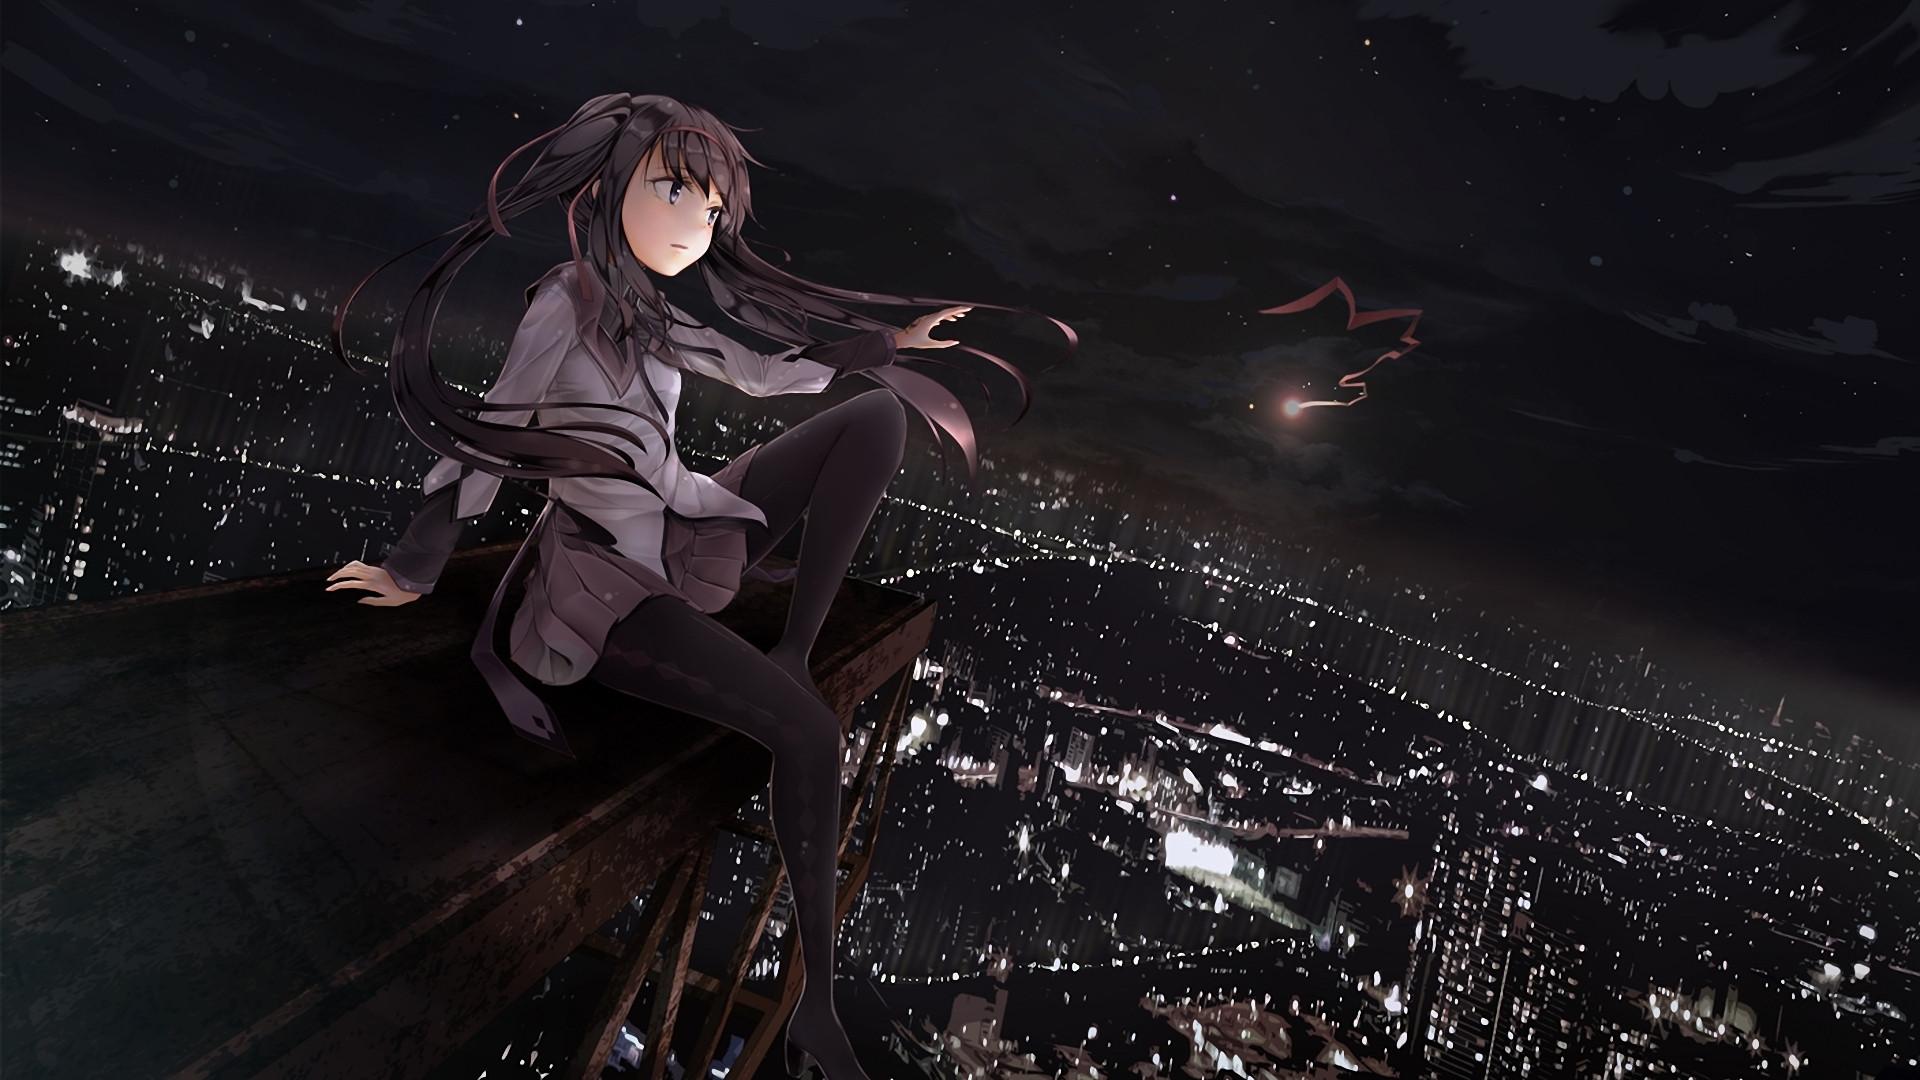 Puella magi madoka magica full hd wallpaper and background - Anime wallpaper black background ...